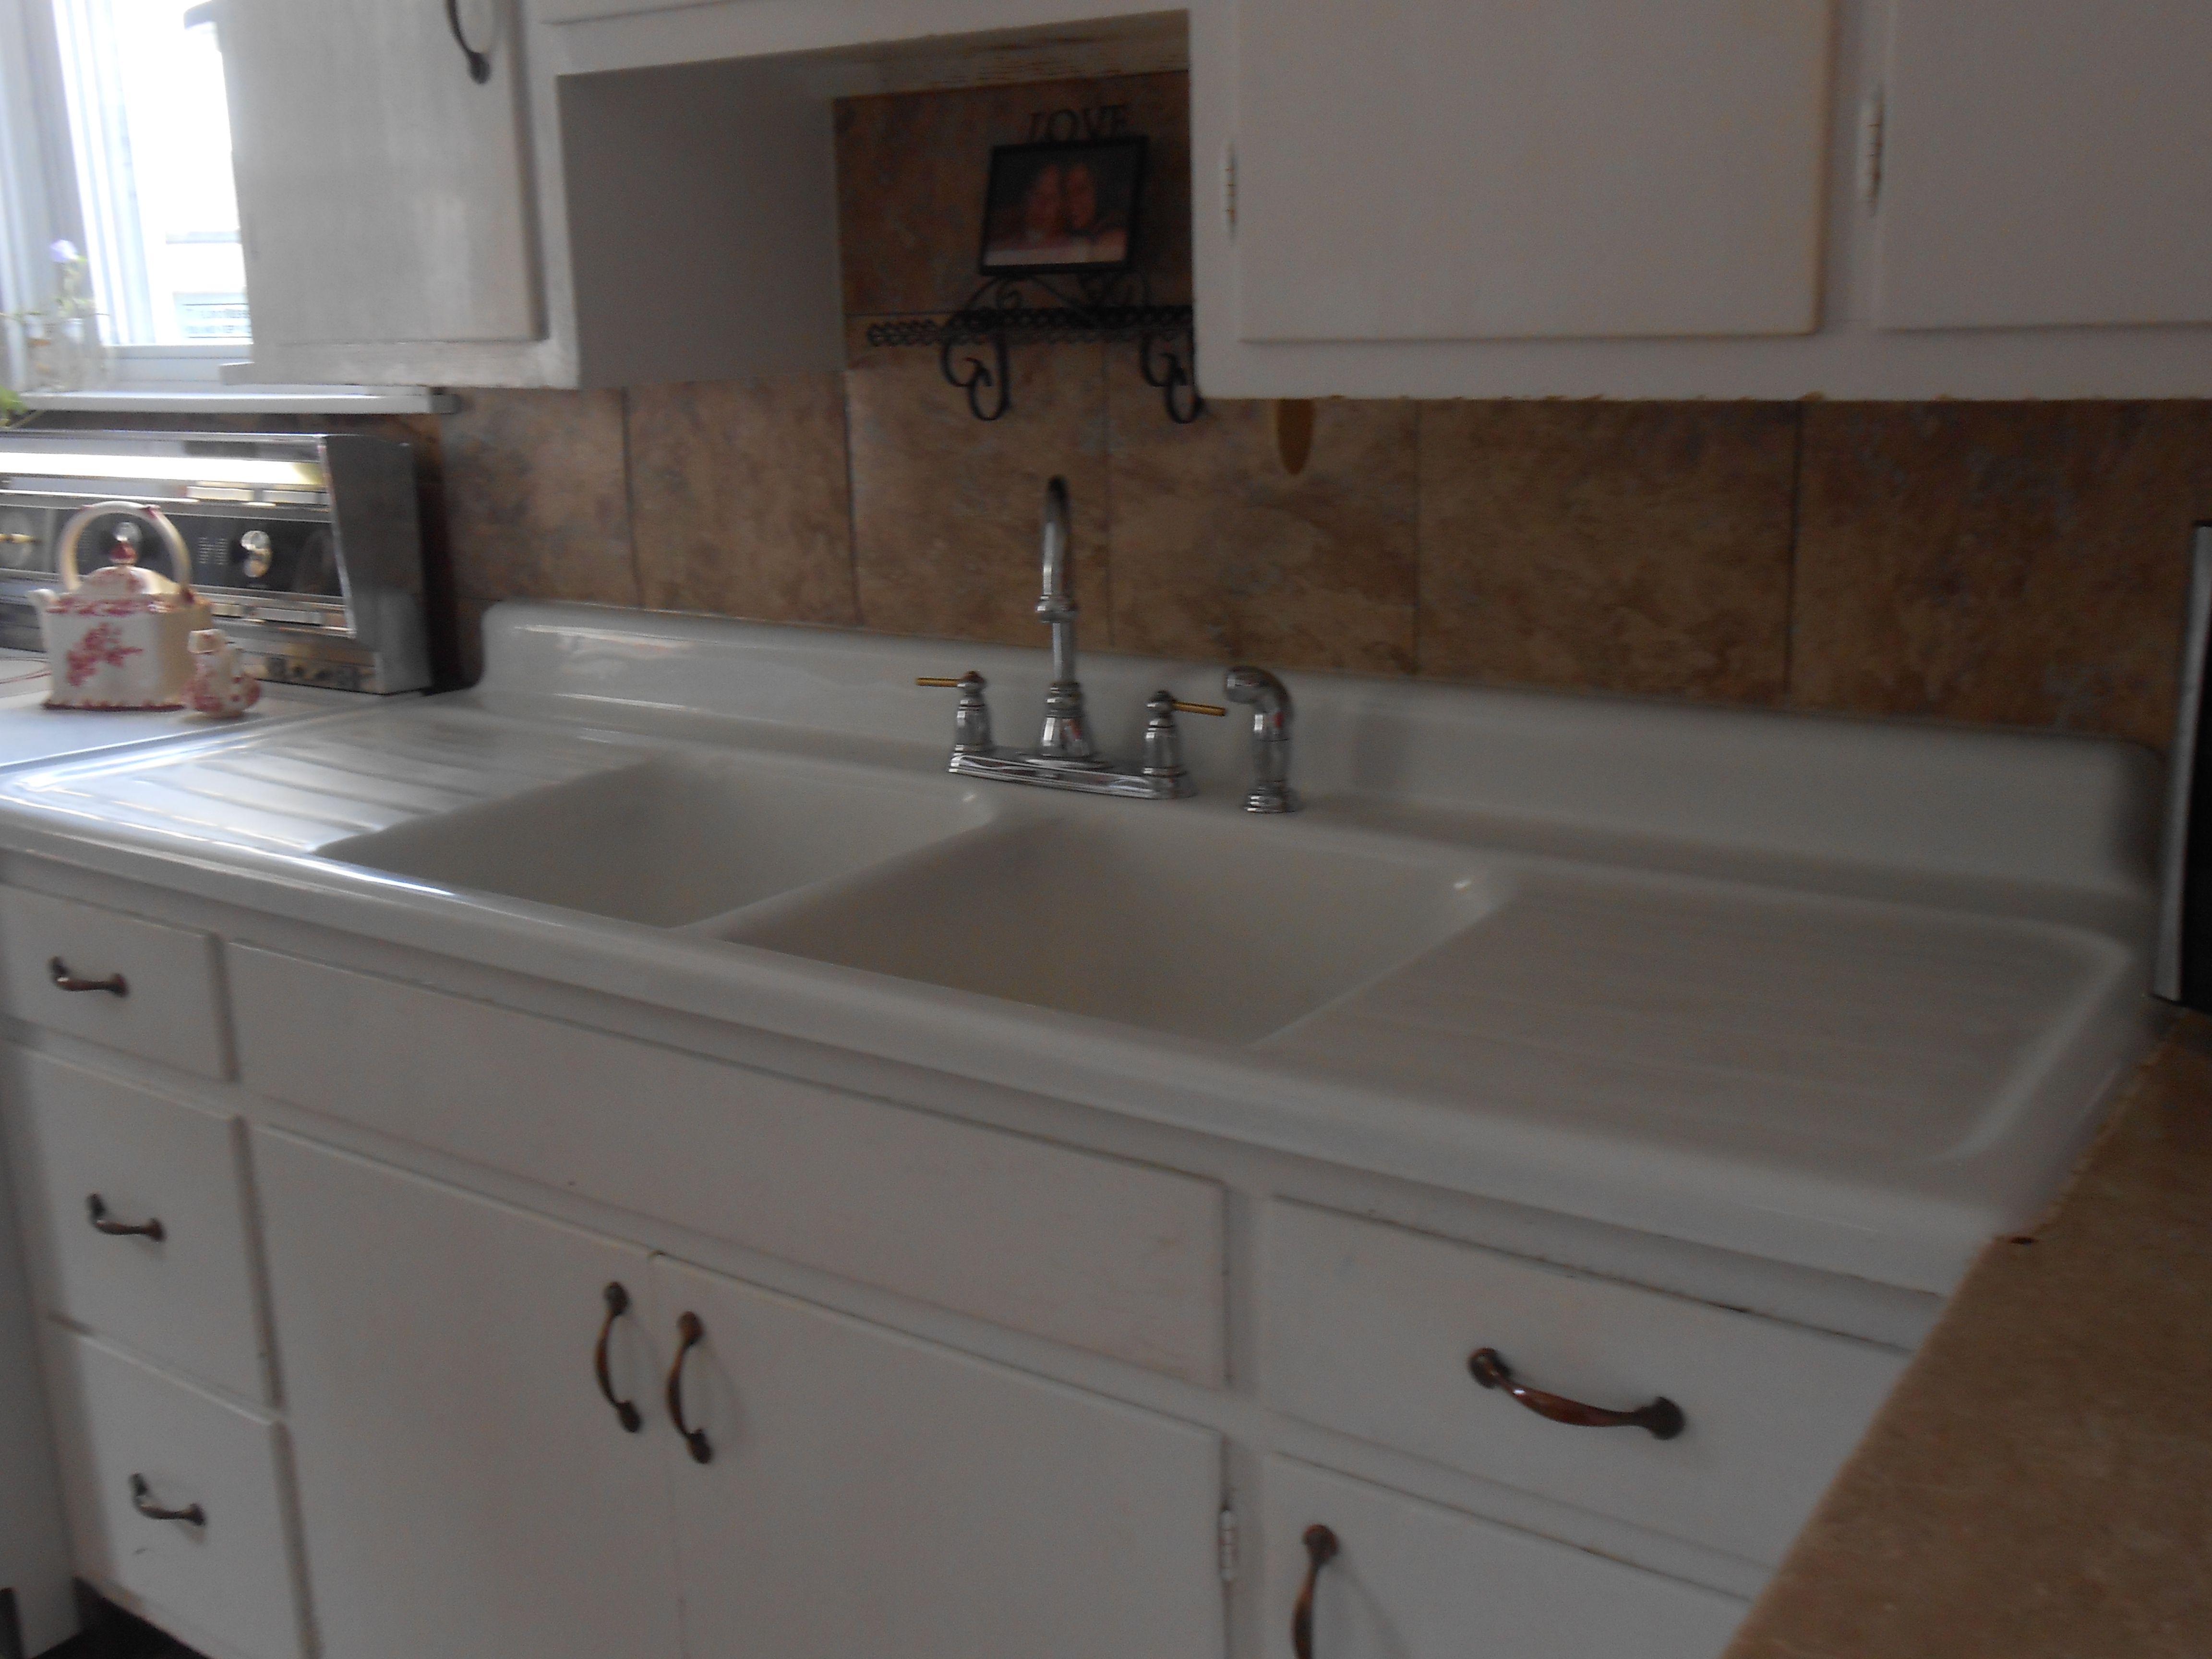 Cast Iron Double Drainboard Sink Cast Iron Kitchen Sinks